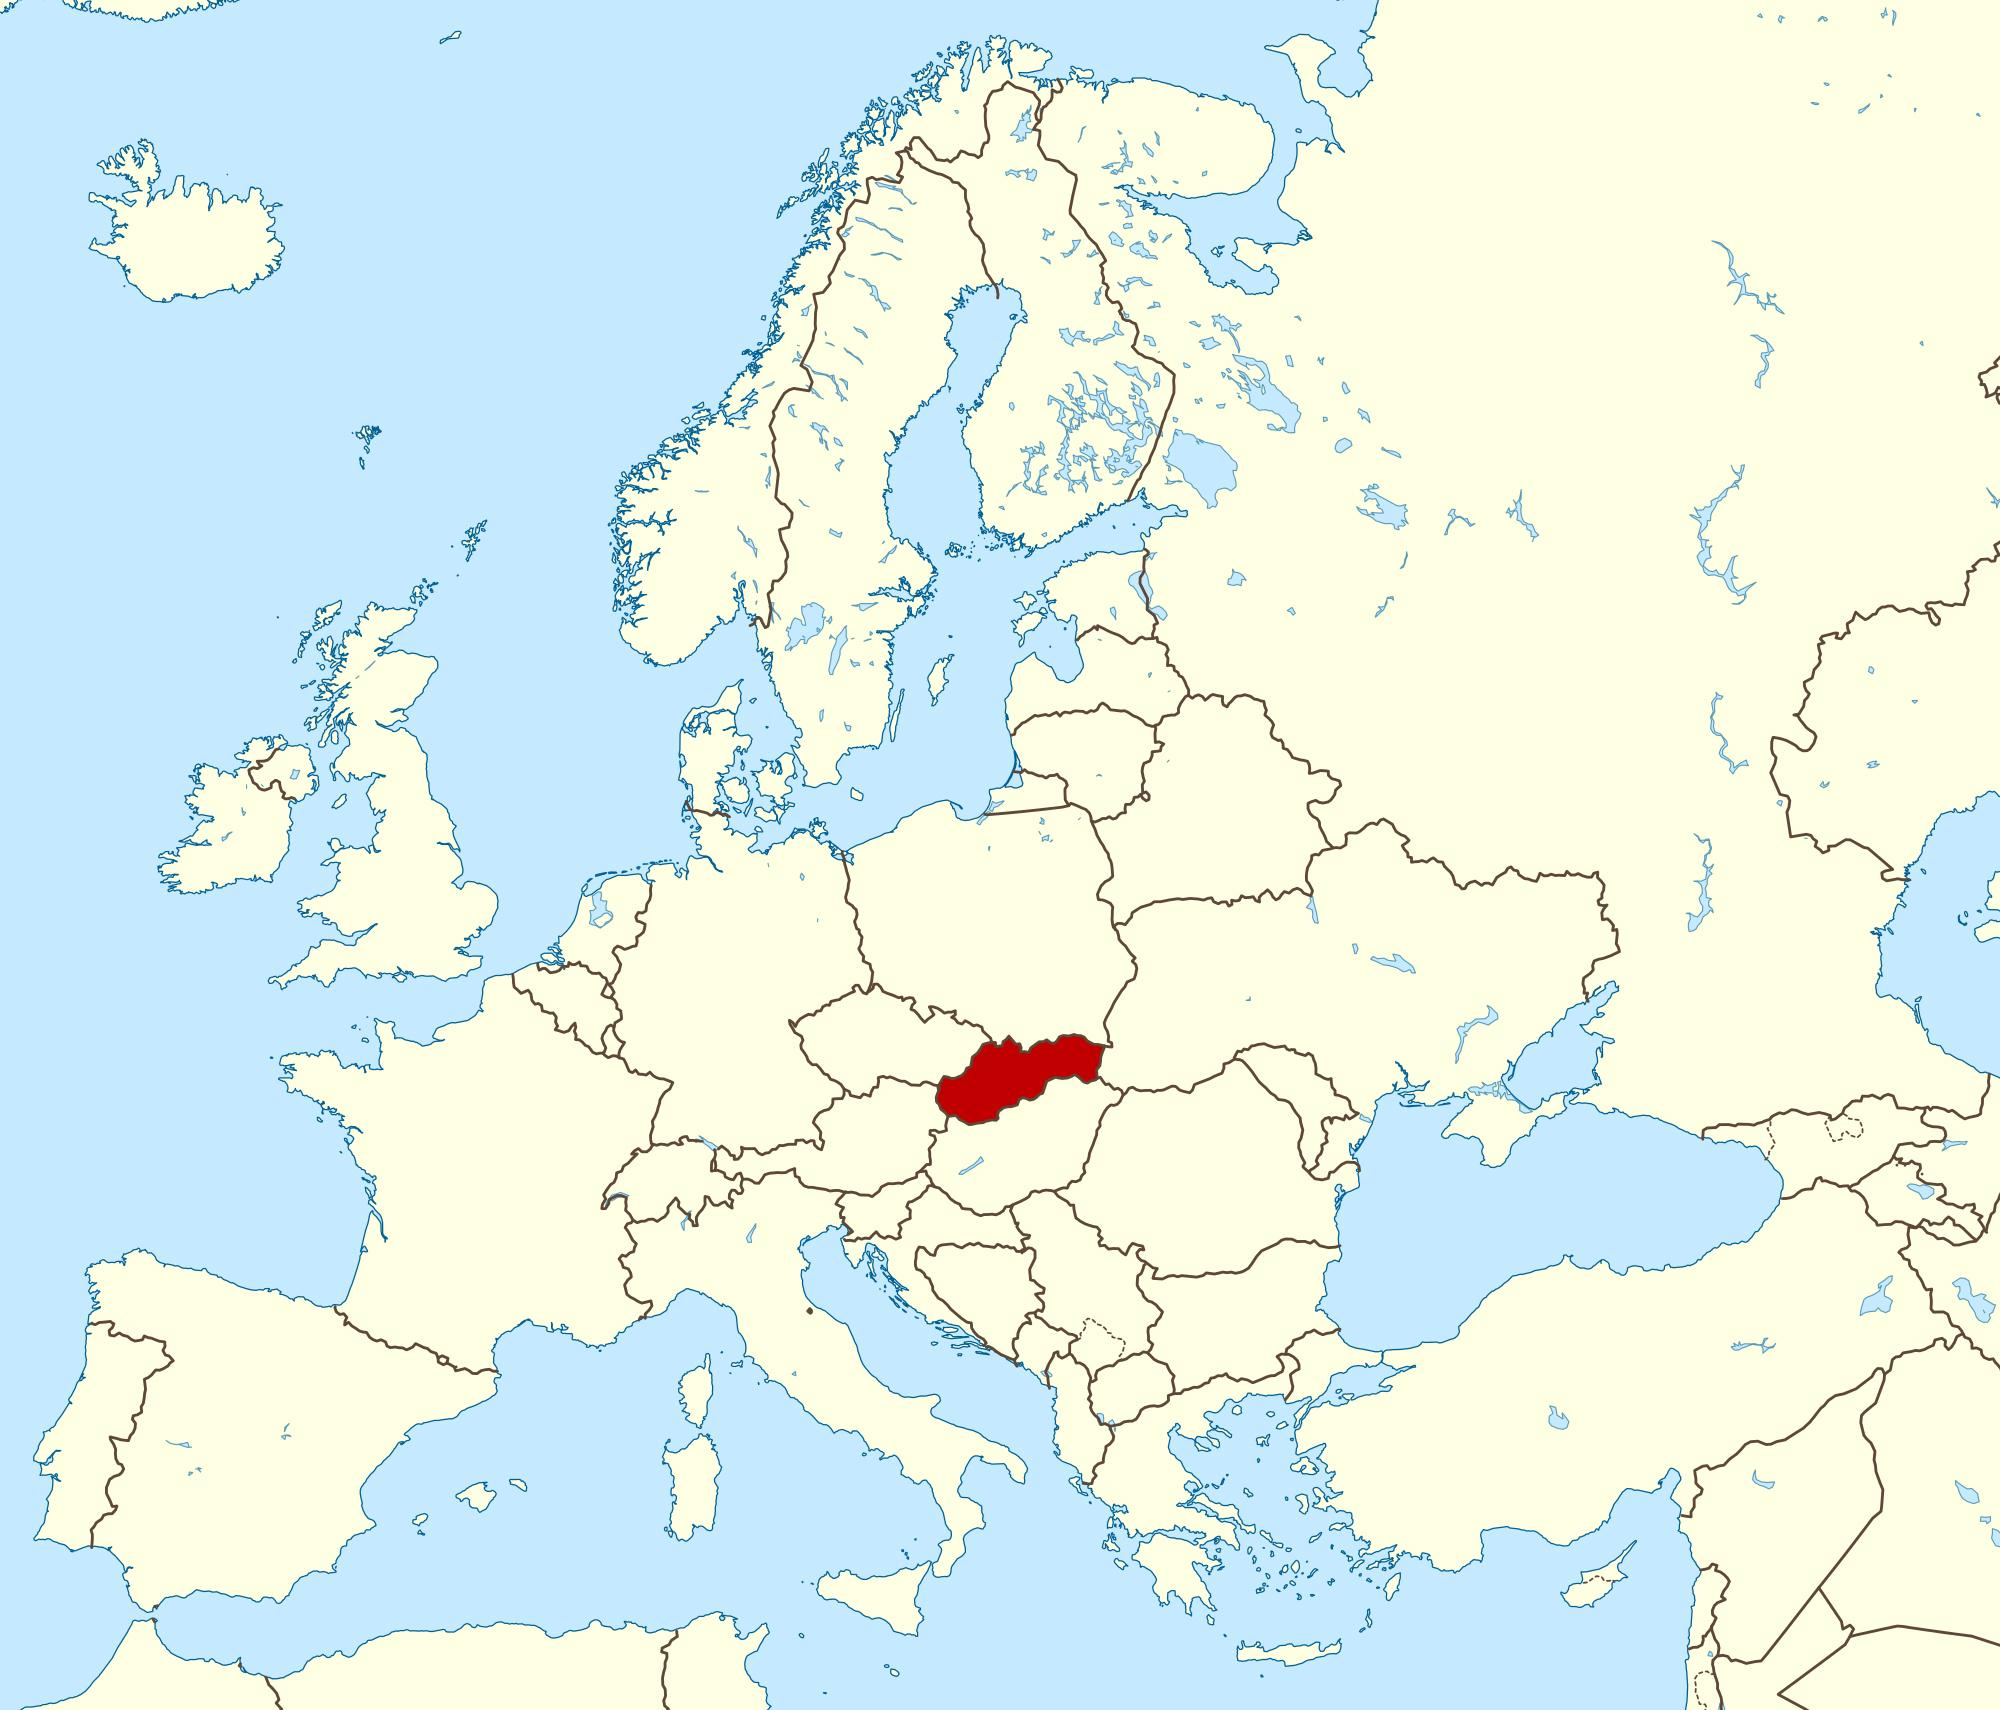 Slovacia Harta Europei Harta Slovacia Hartă A Europei Europa De